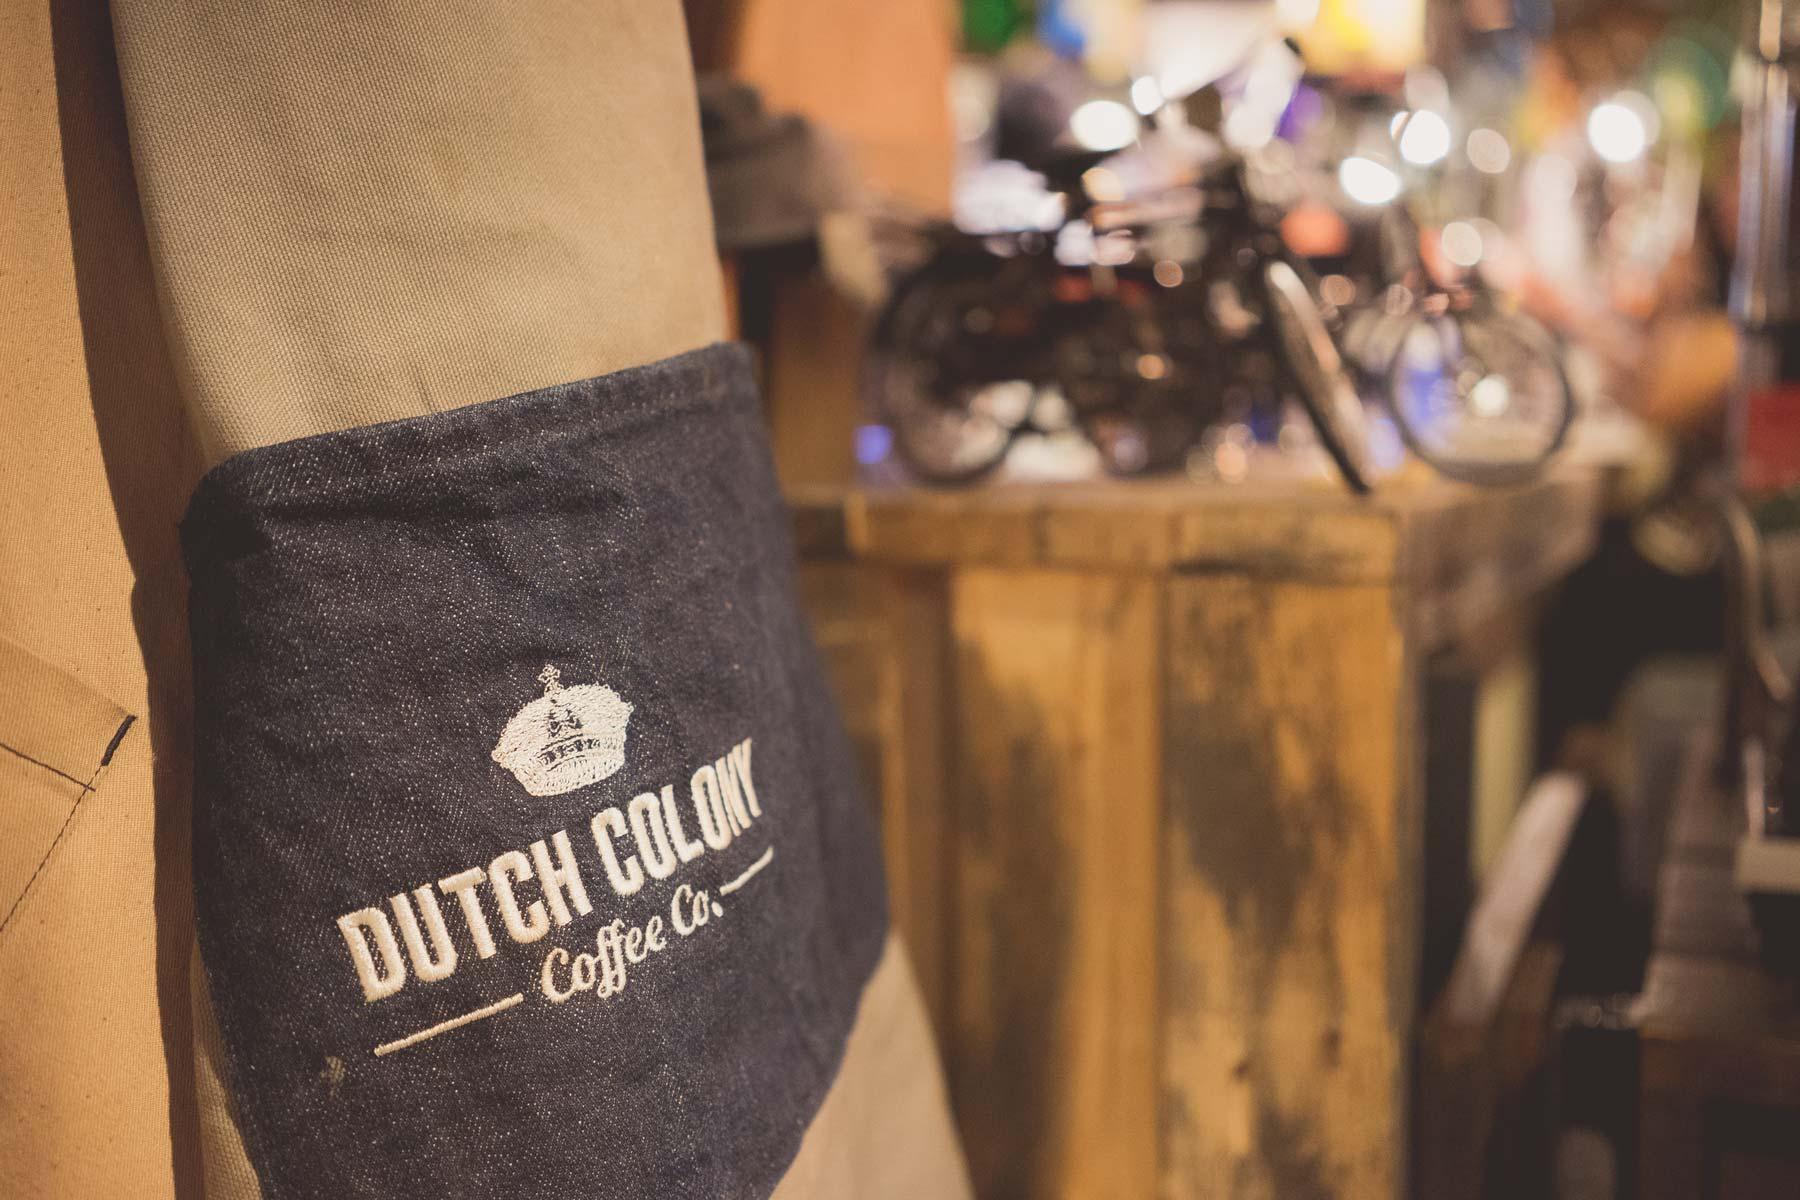 Dutch colony coffee workshop